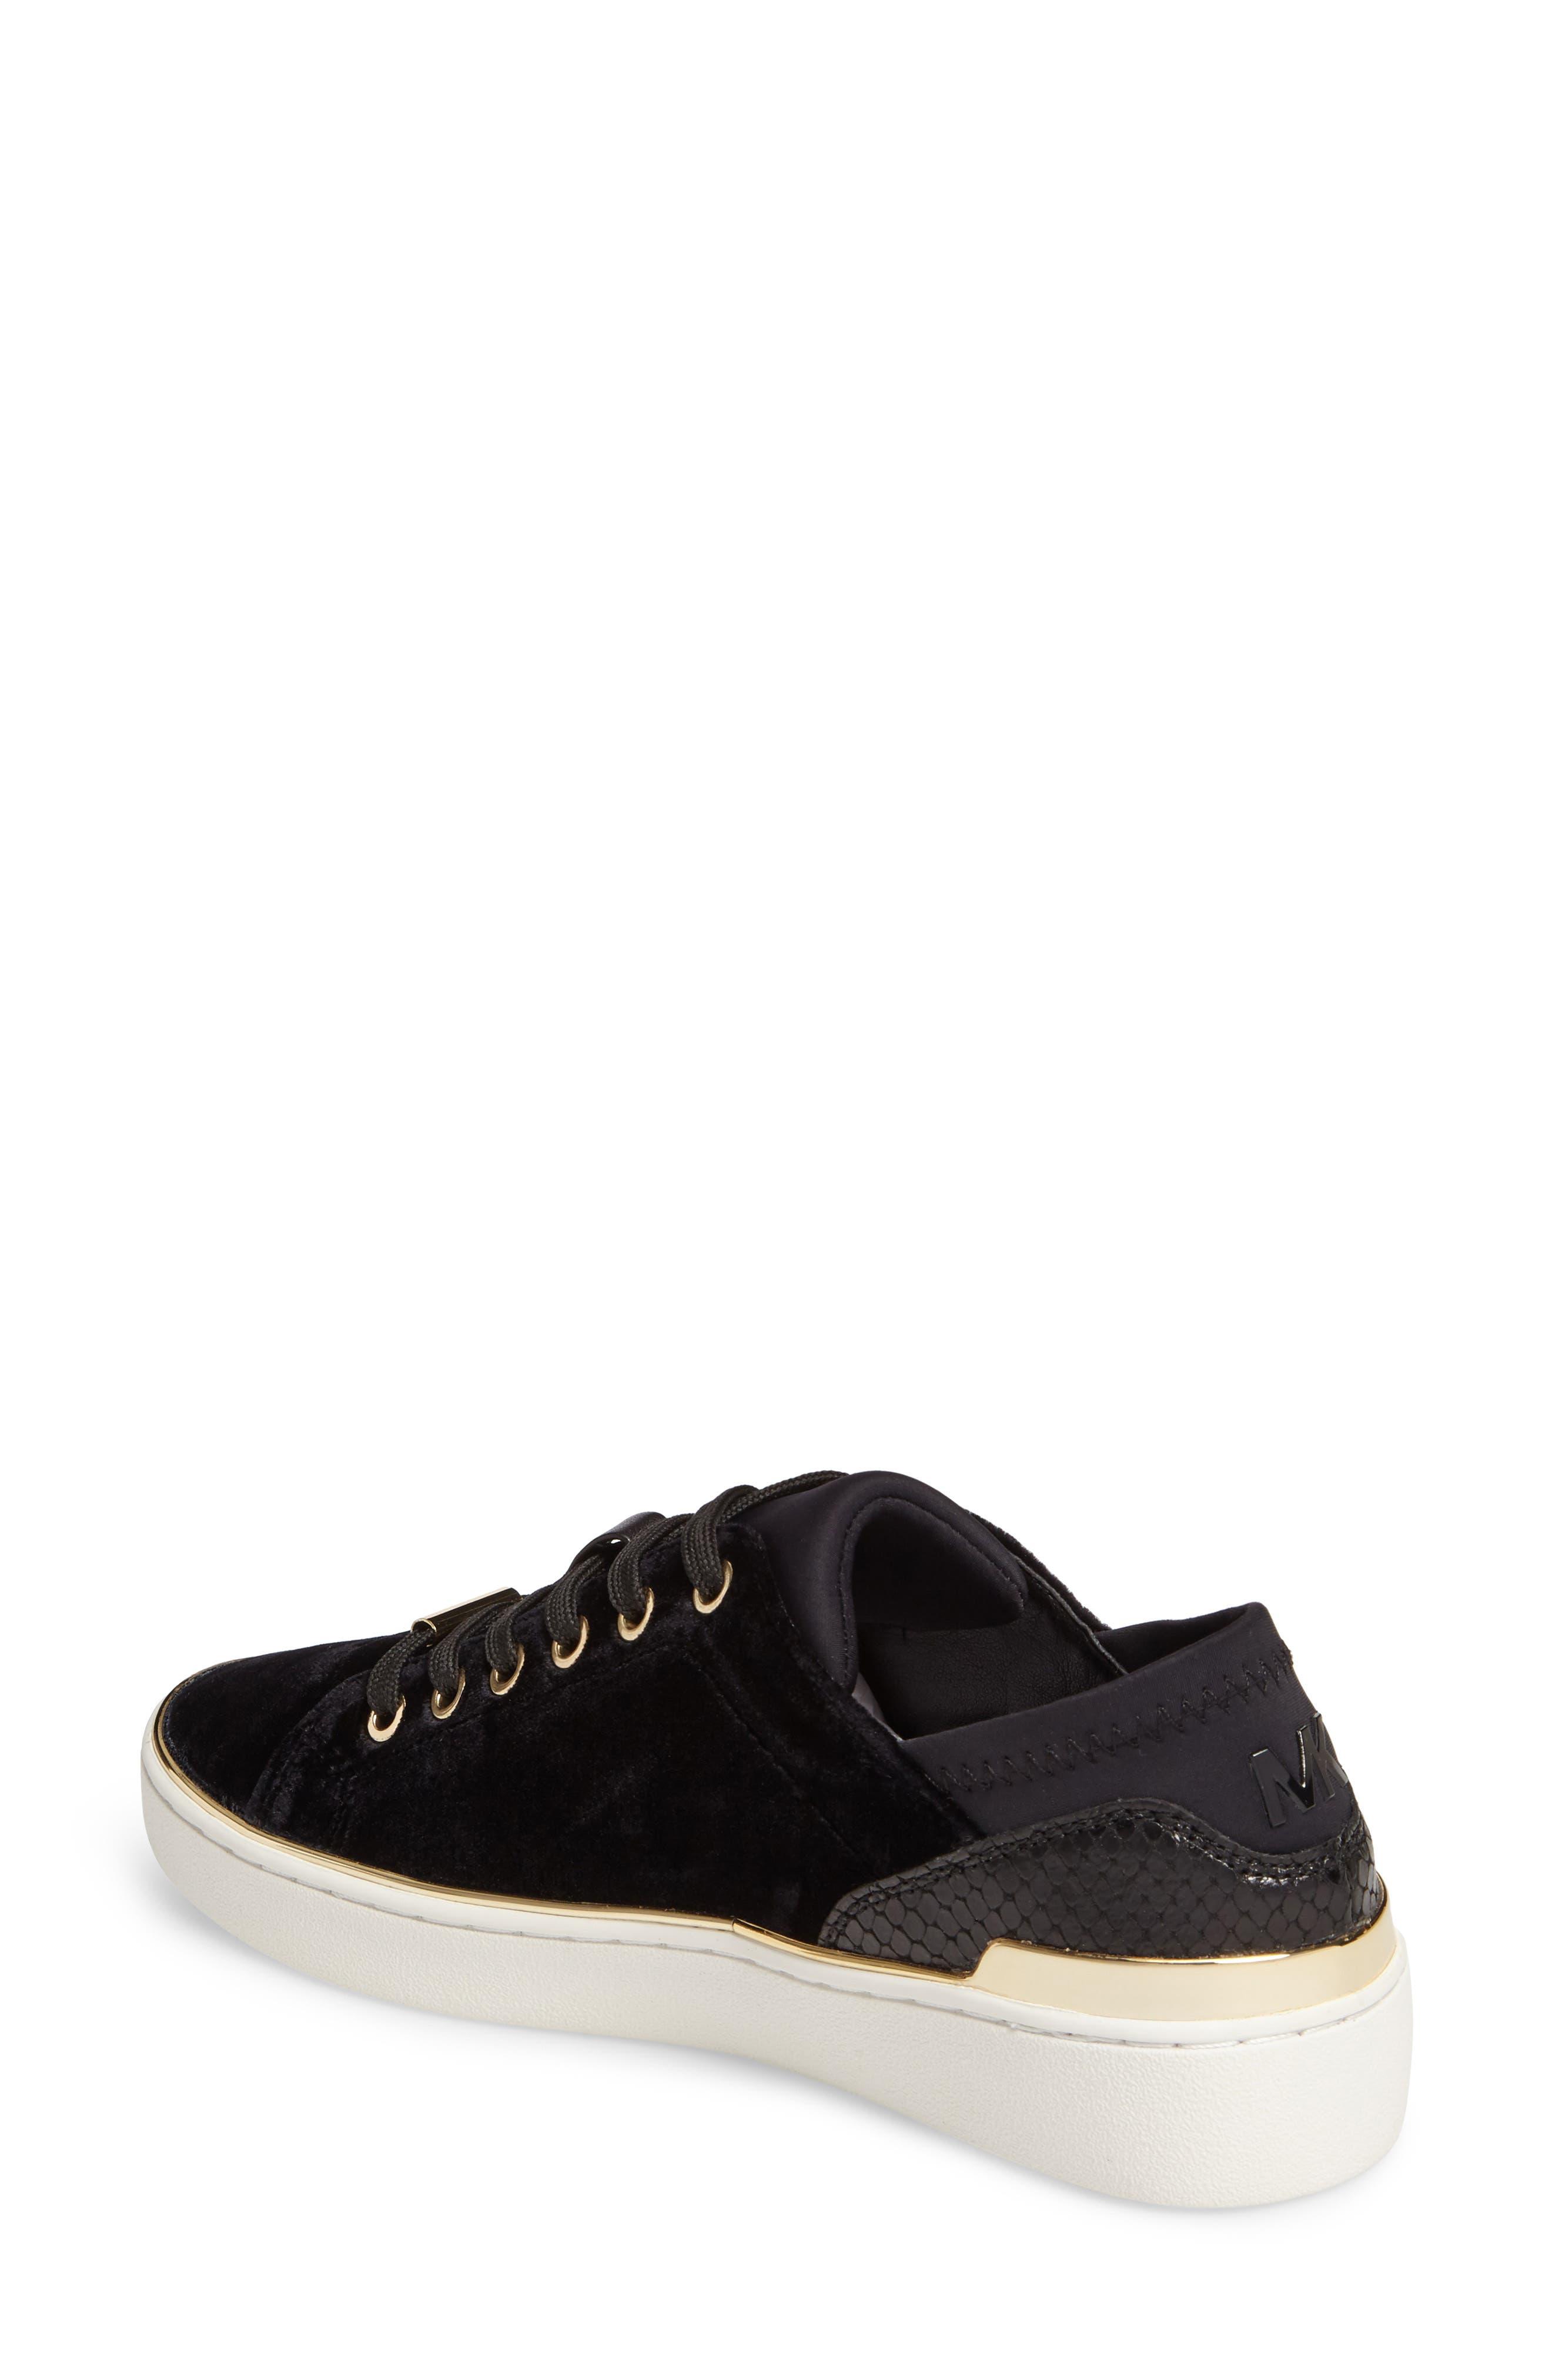 Scout Sneaker,                             Alternate thumbnail 2, color,                             Black